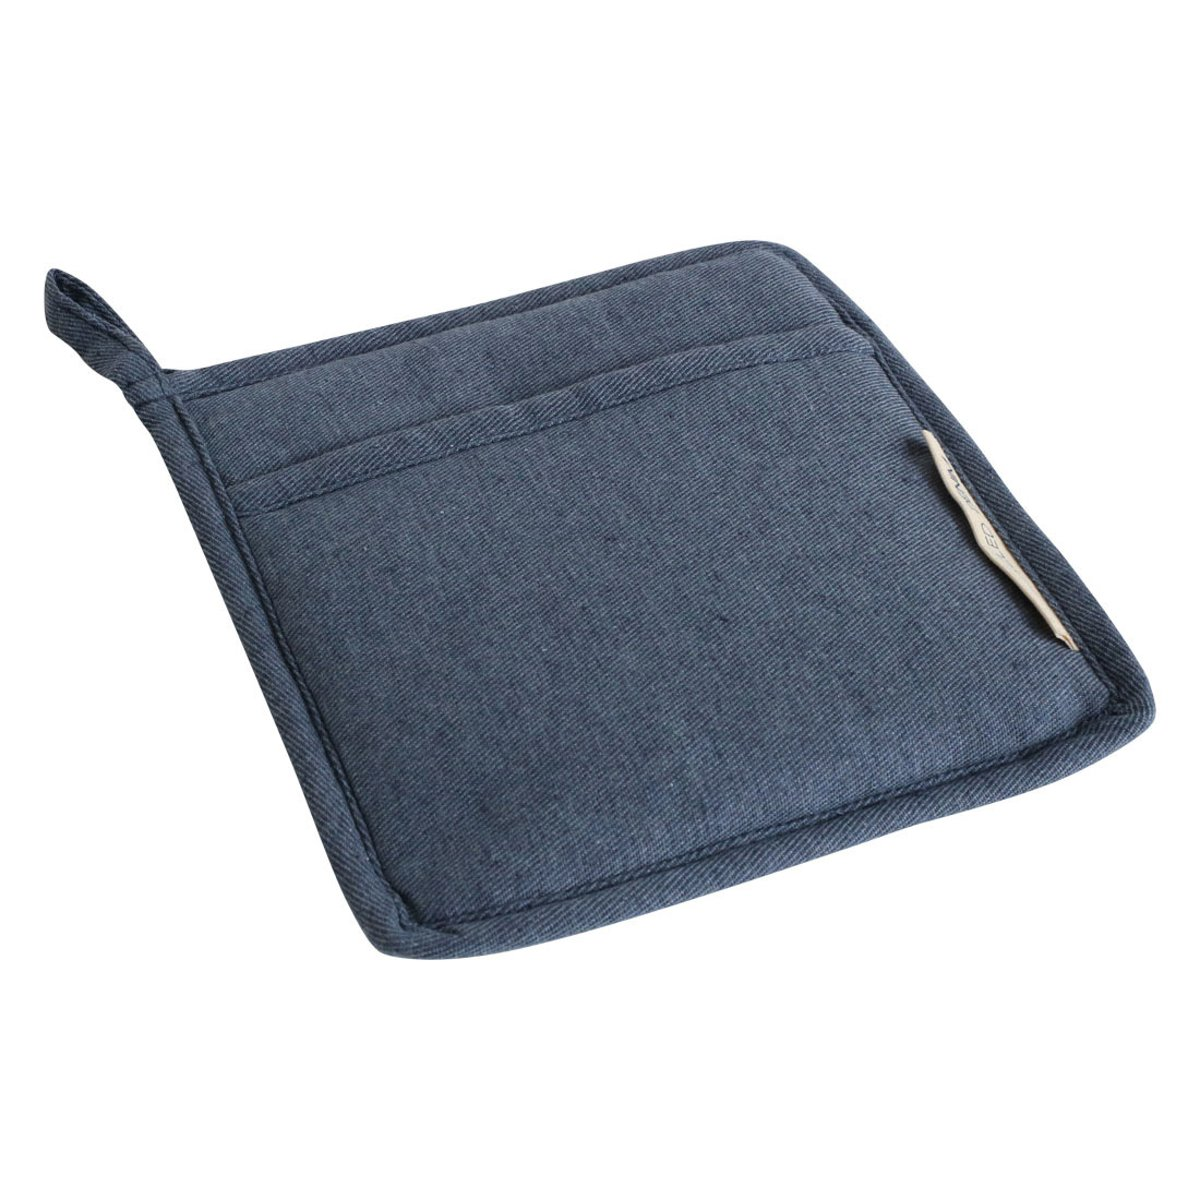 Upcycled Denim Pannenlap - Onderzetter - 21,5x21,5 - Donker blauw kopen